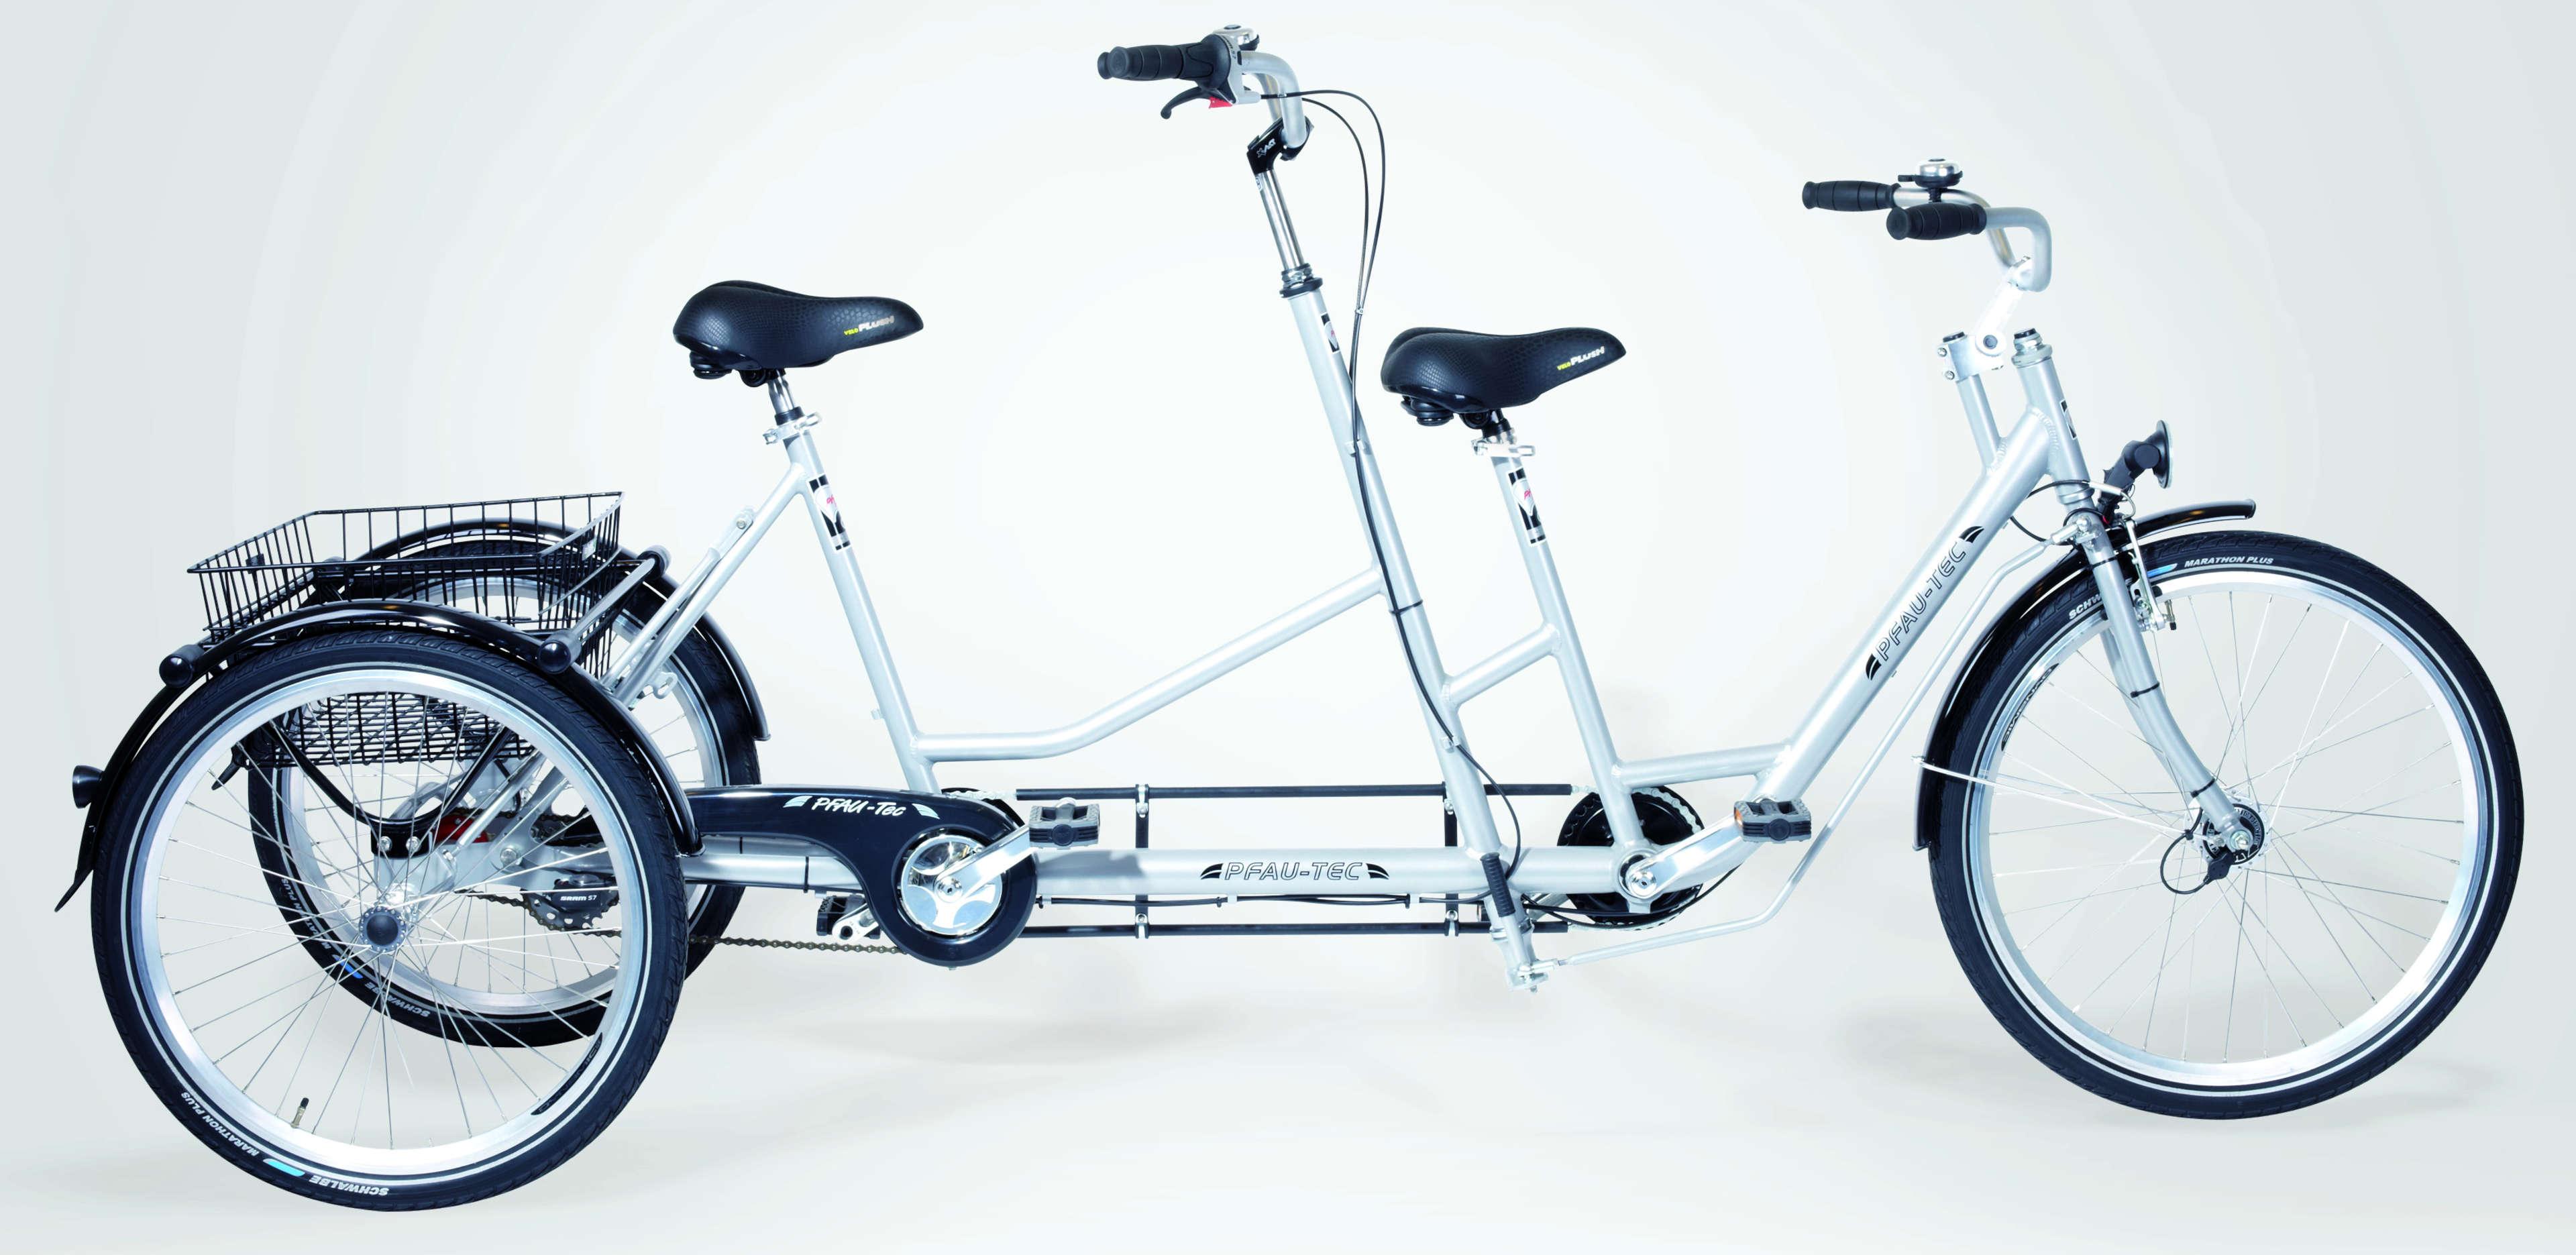 pfau tec dreirad fusione tandem eurorad bikeleasingeurorad bikeleasing. Black Bedroom Furniture Sets. Home Design Ideas